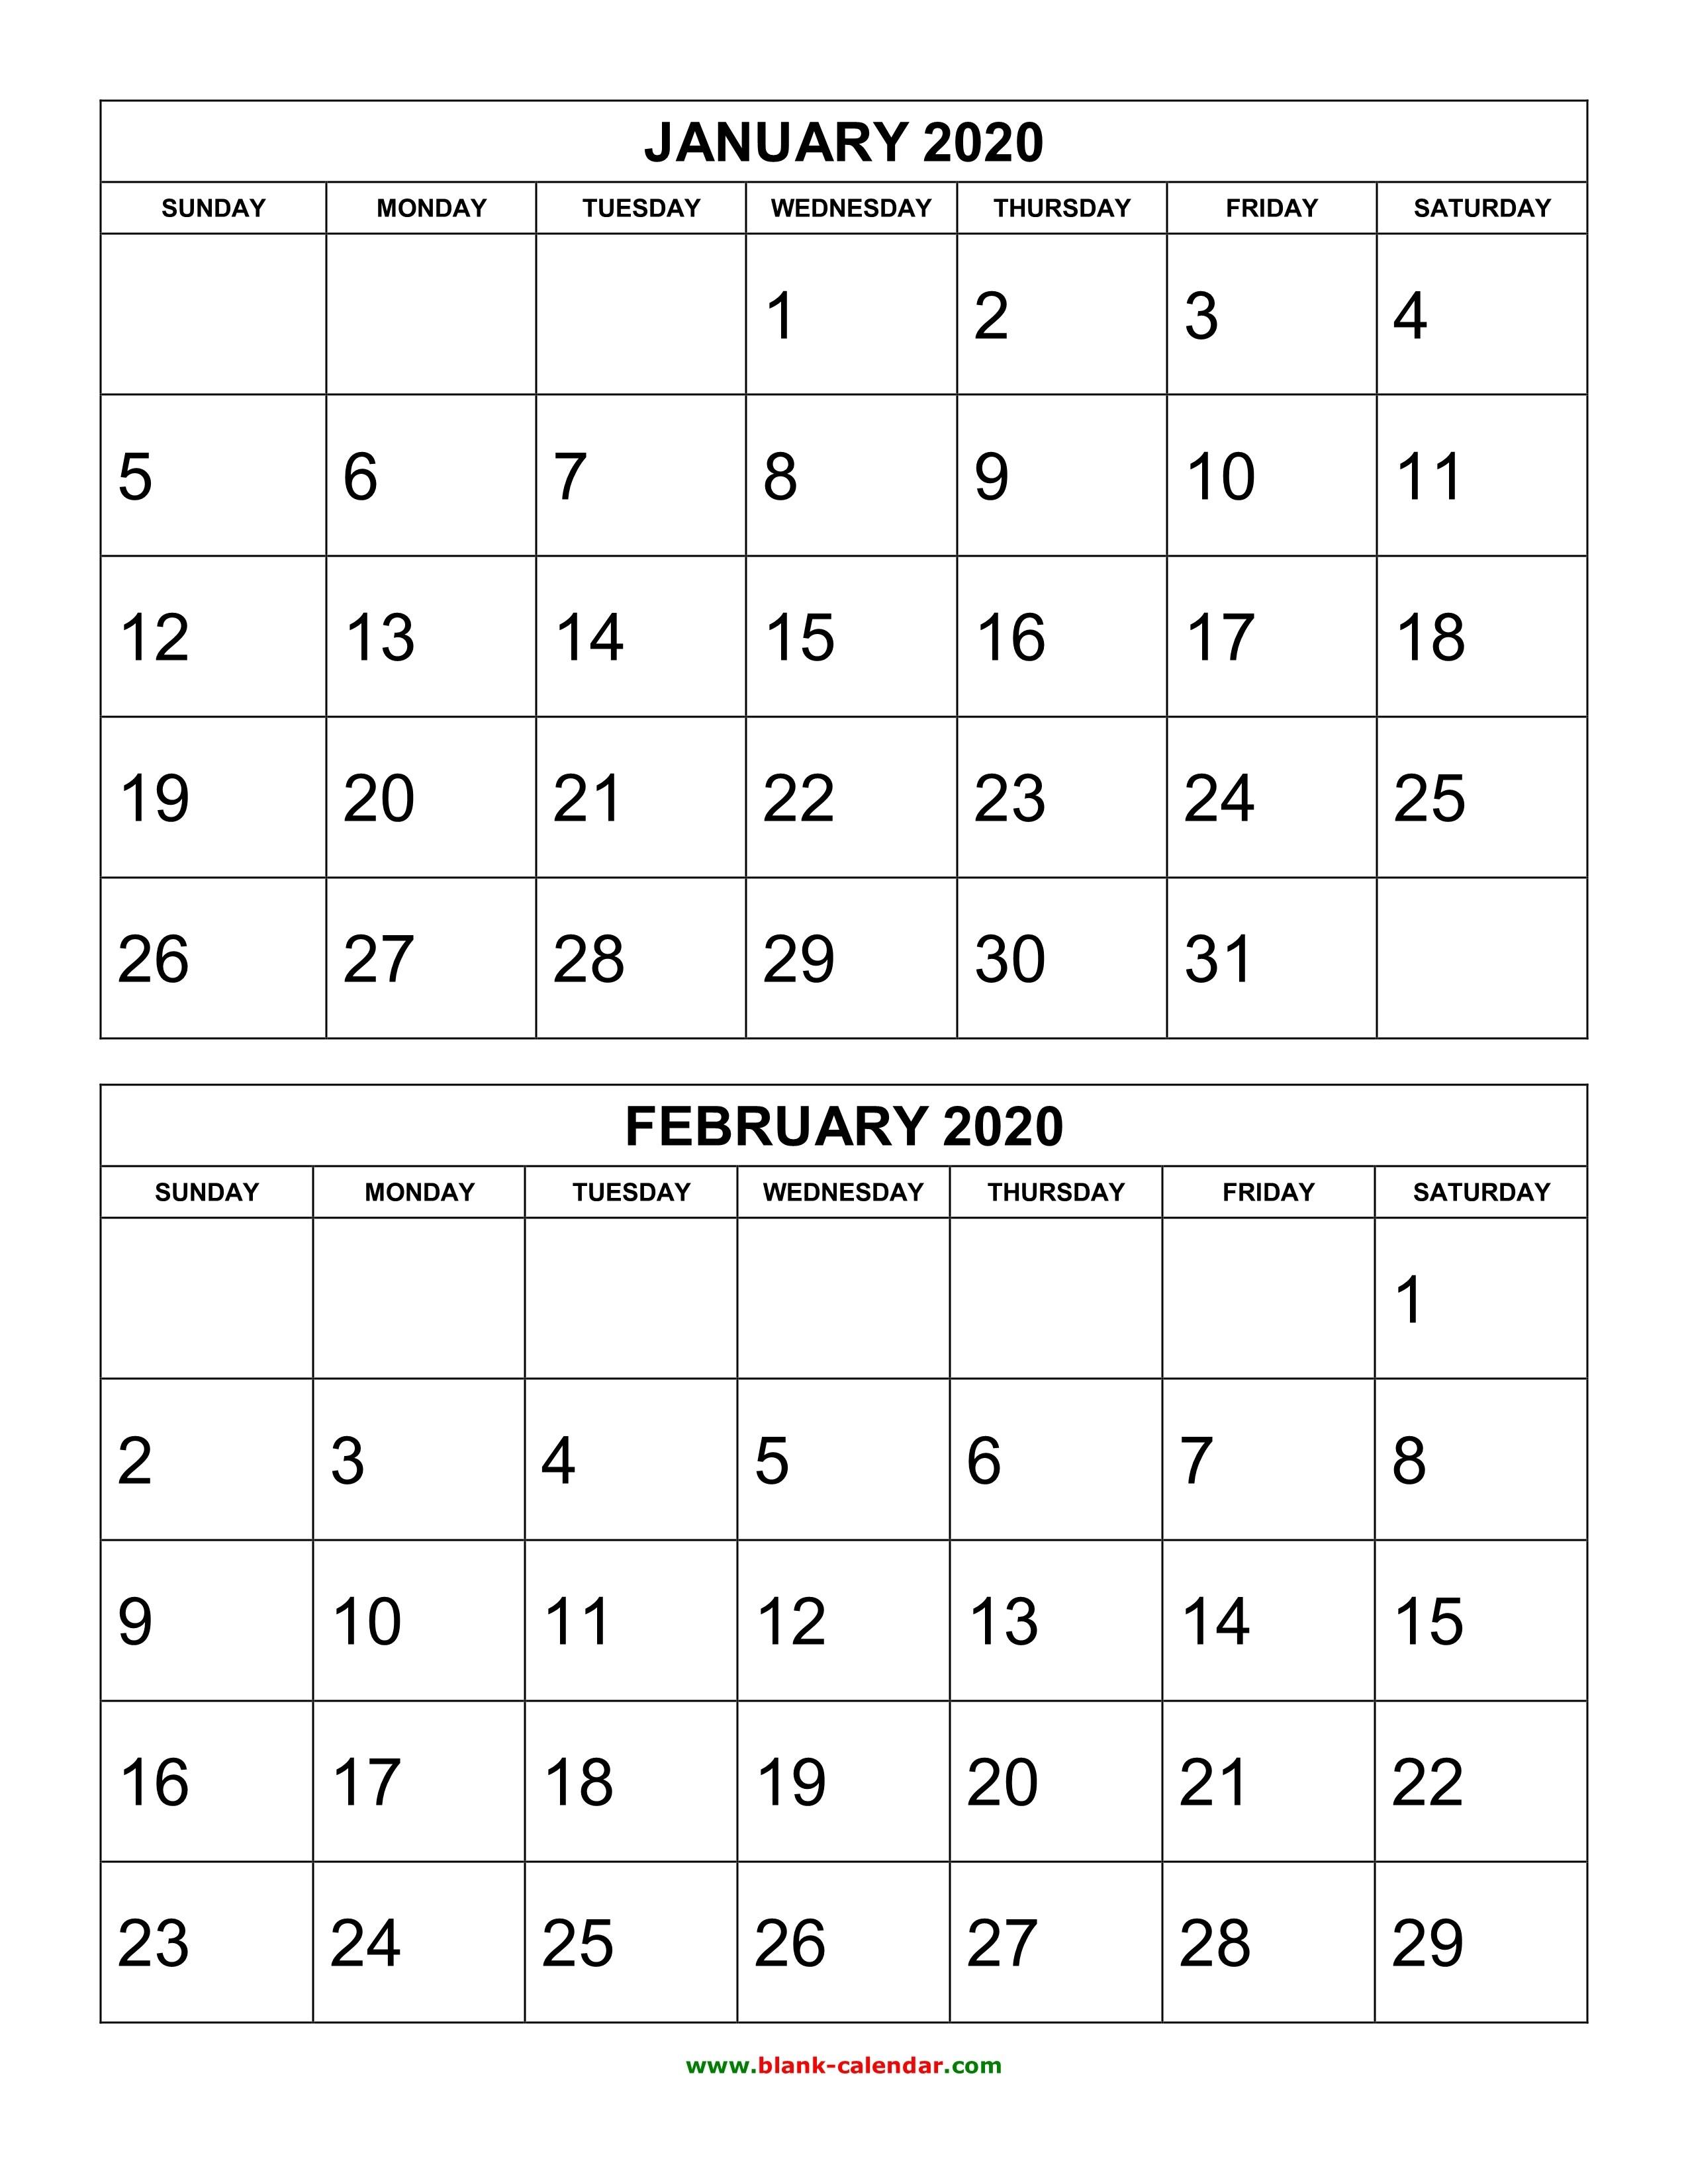 Free Download Printable Calendar 2020, 2 Months Per Page, 6-Printable Calendar 2020 Monthly On 2 Pages